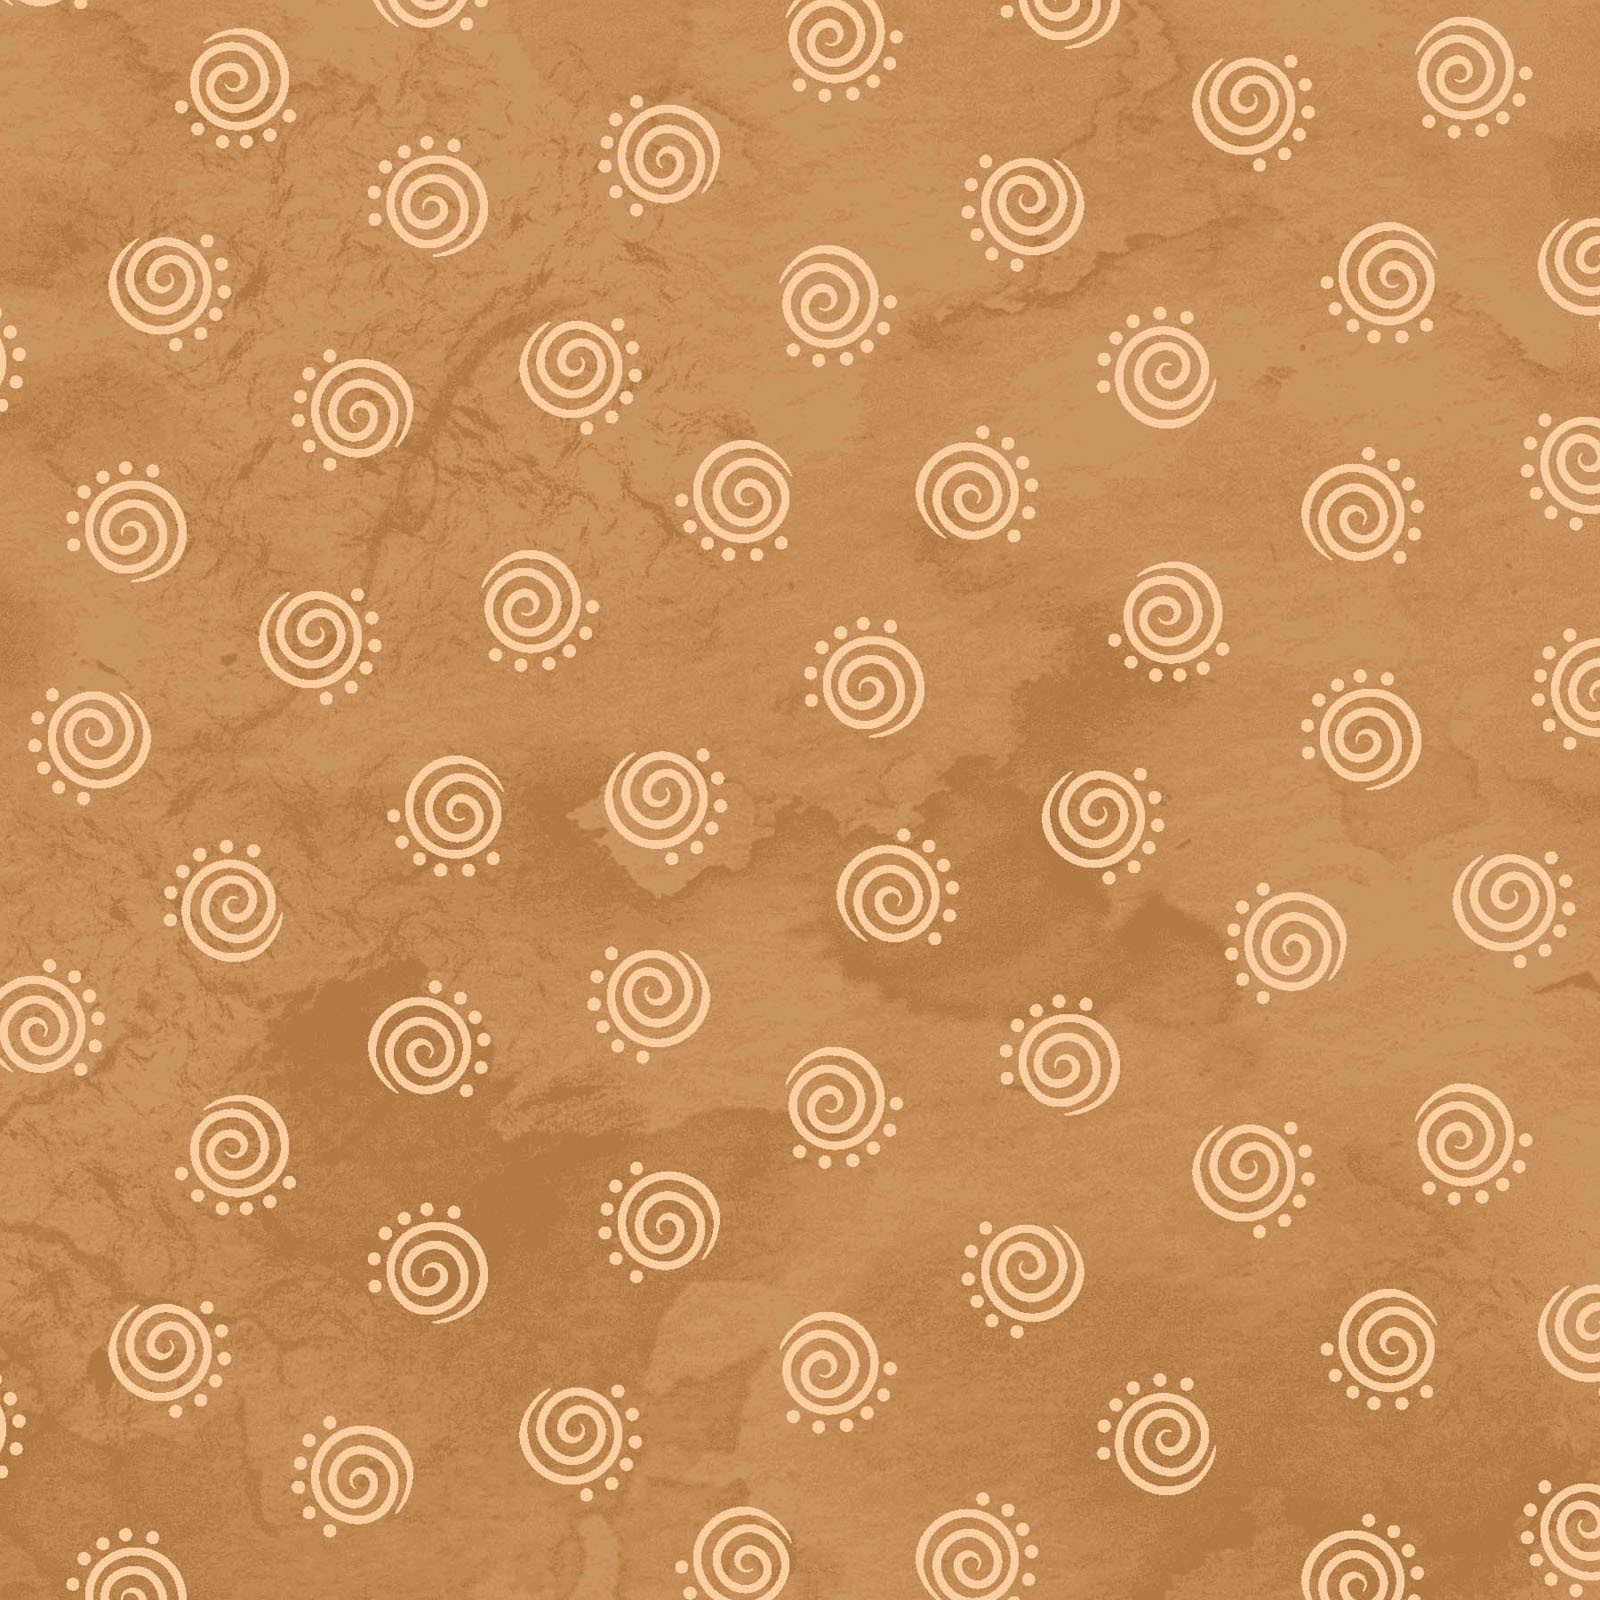 In Stitches by Robin Kingsley for Maywood Studio - MAS8617-T Geo Swirls